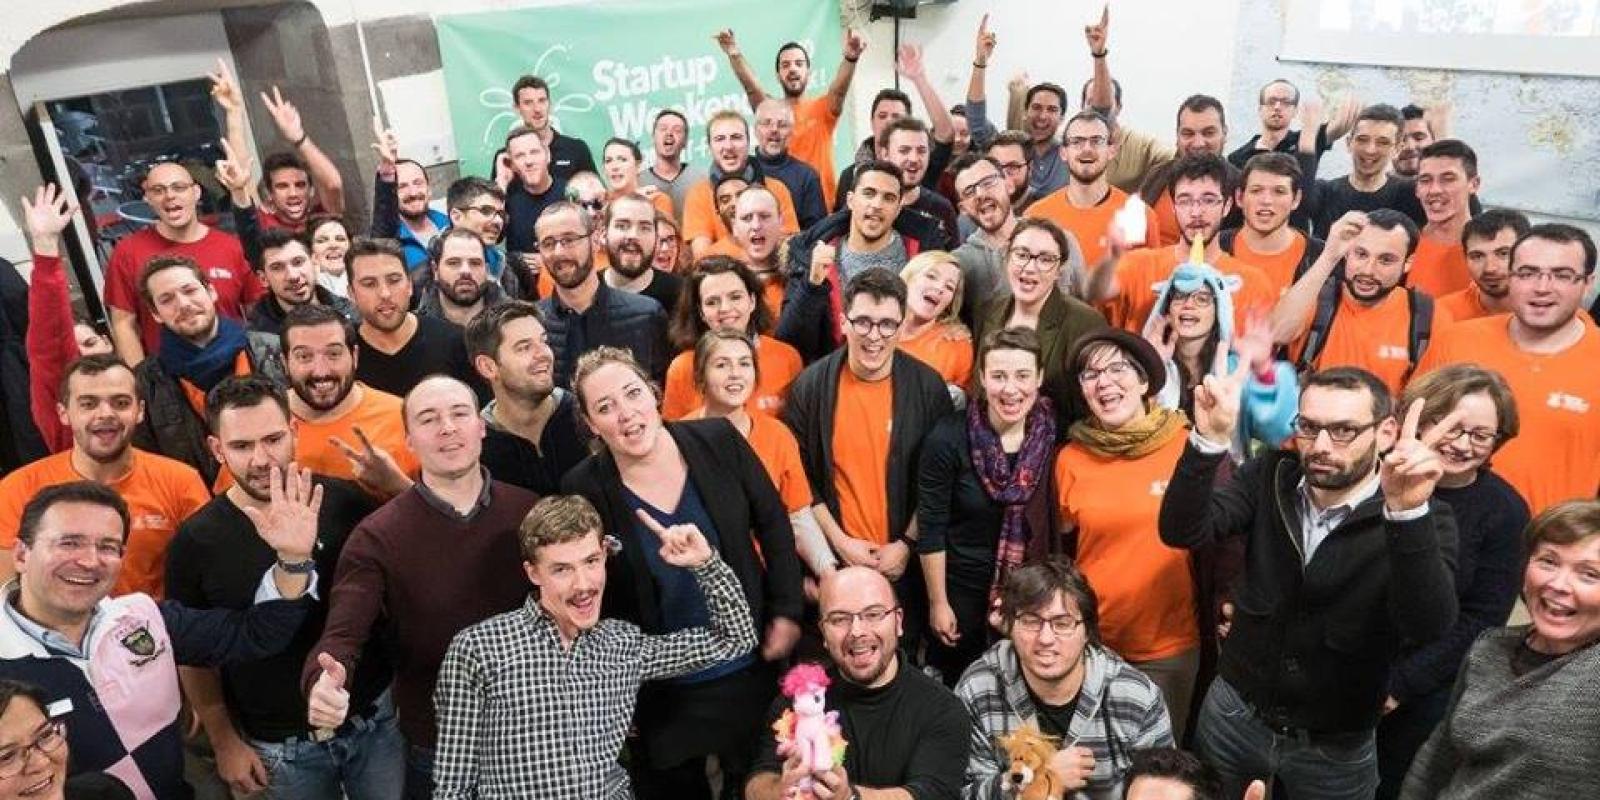 Startup Weekend Clermont 2017